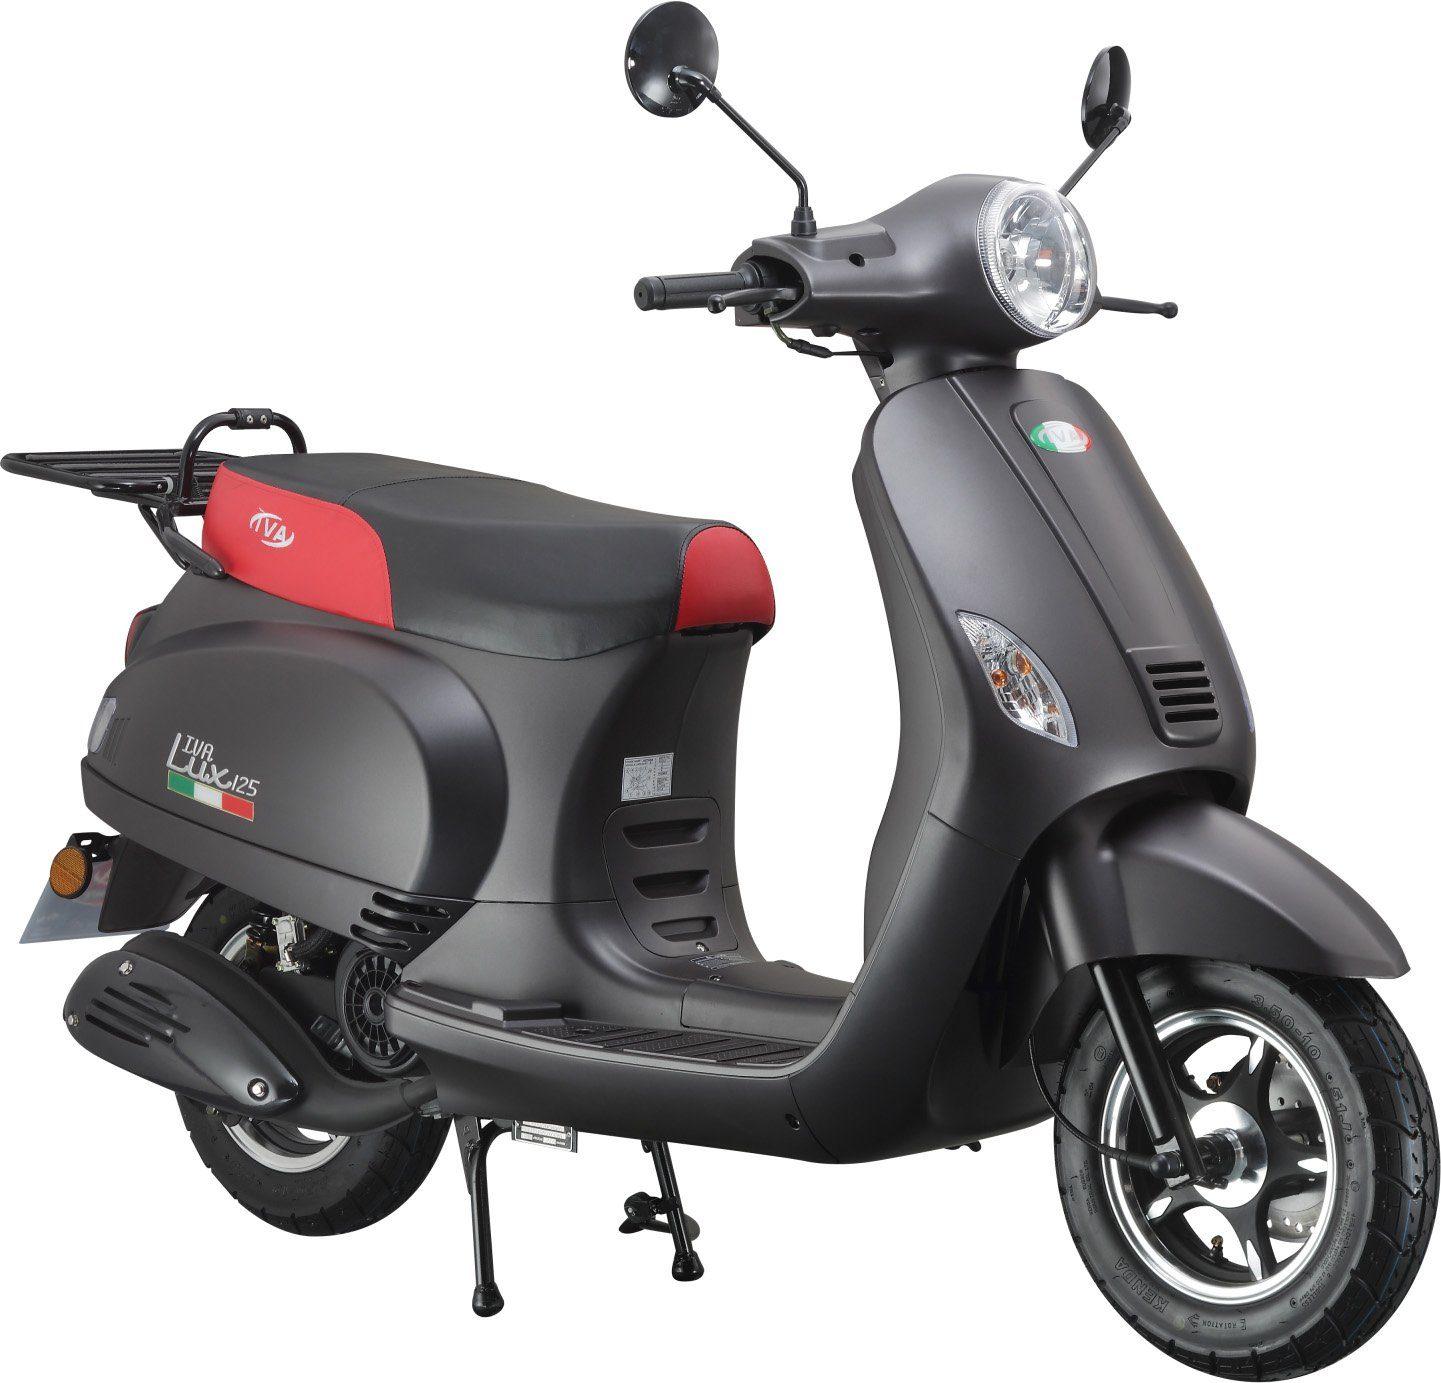 IVA Motorroller, 125 ccm 75 km/h, schwarz-matt, »LUX«